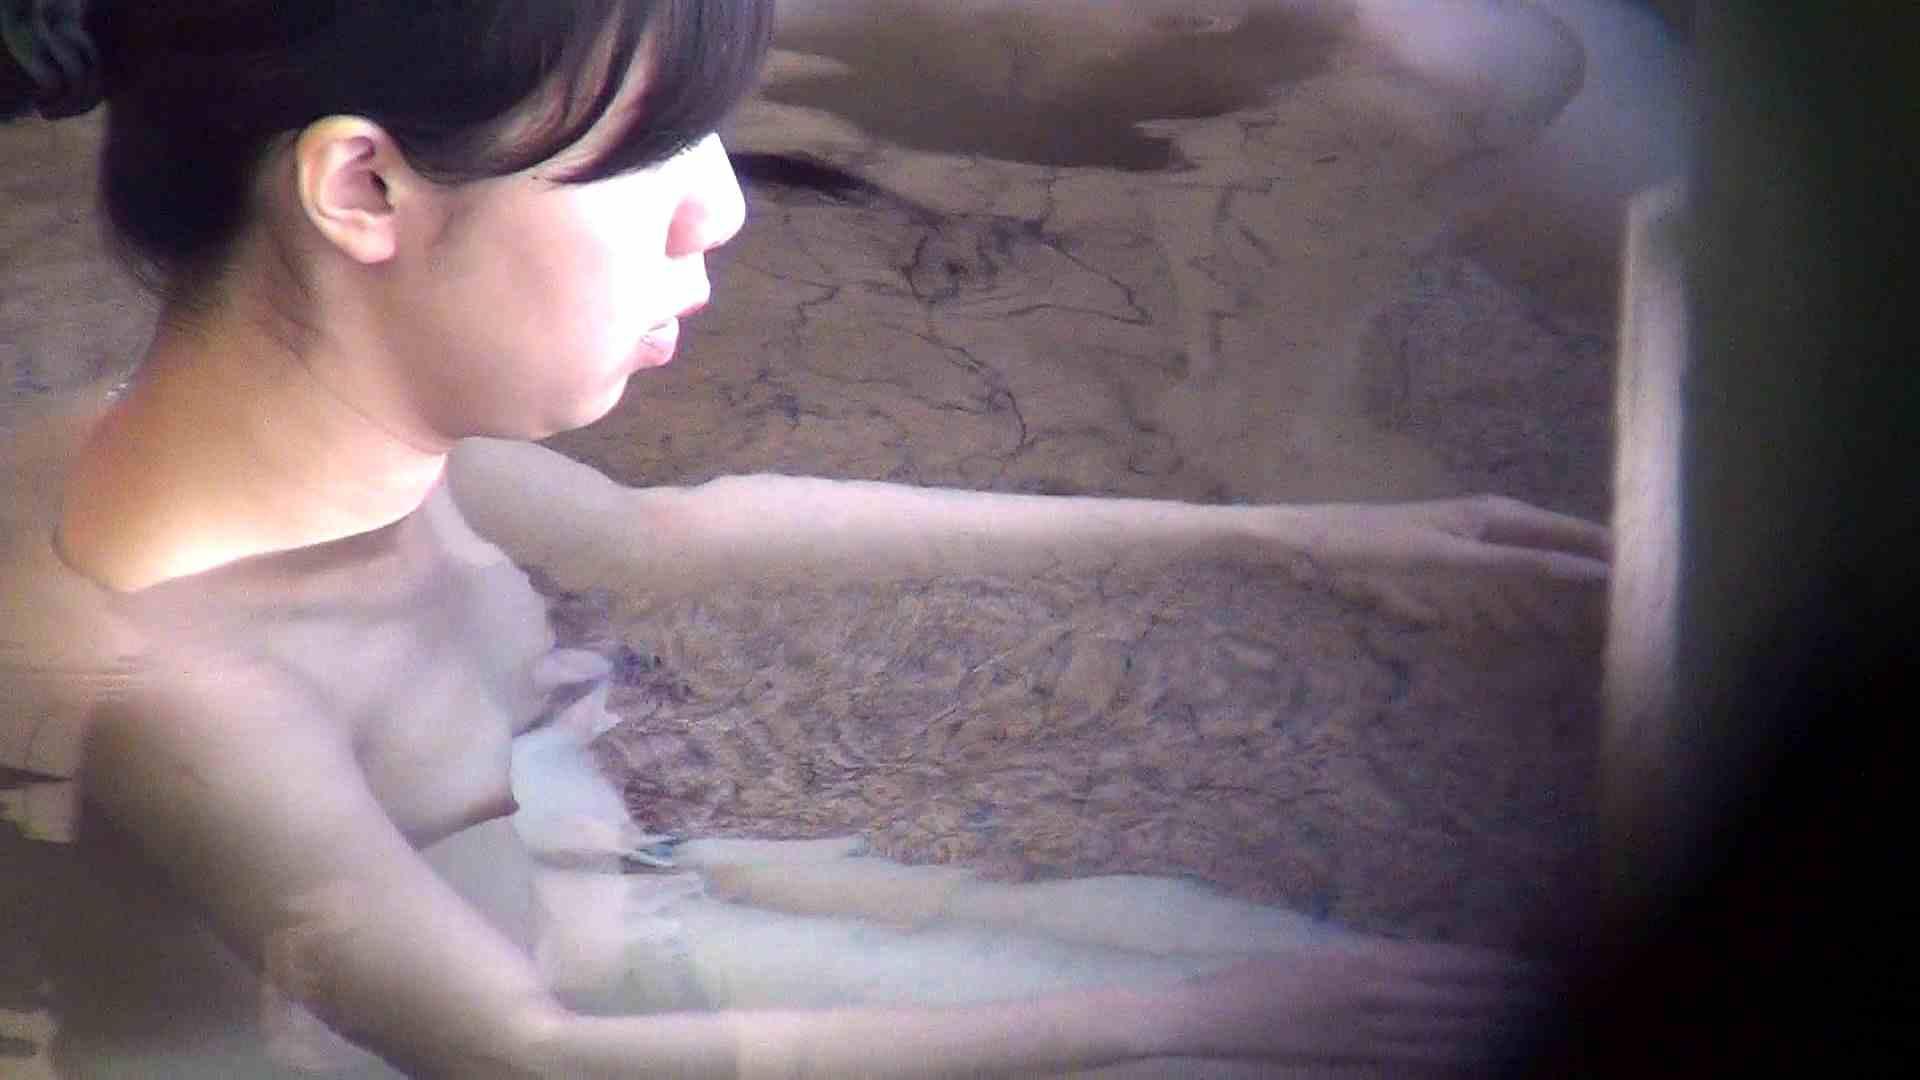 Aquaな露天風呂Vol.285 盗撮  97連発 93